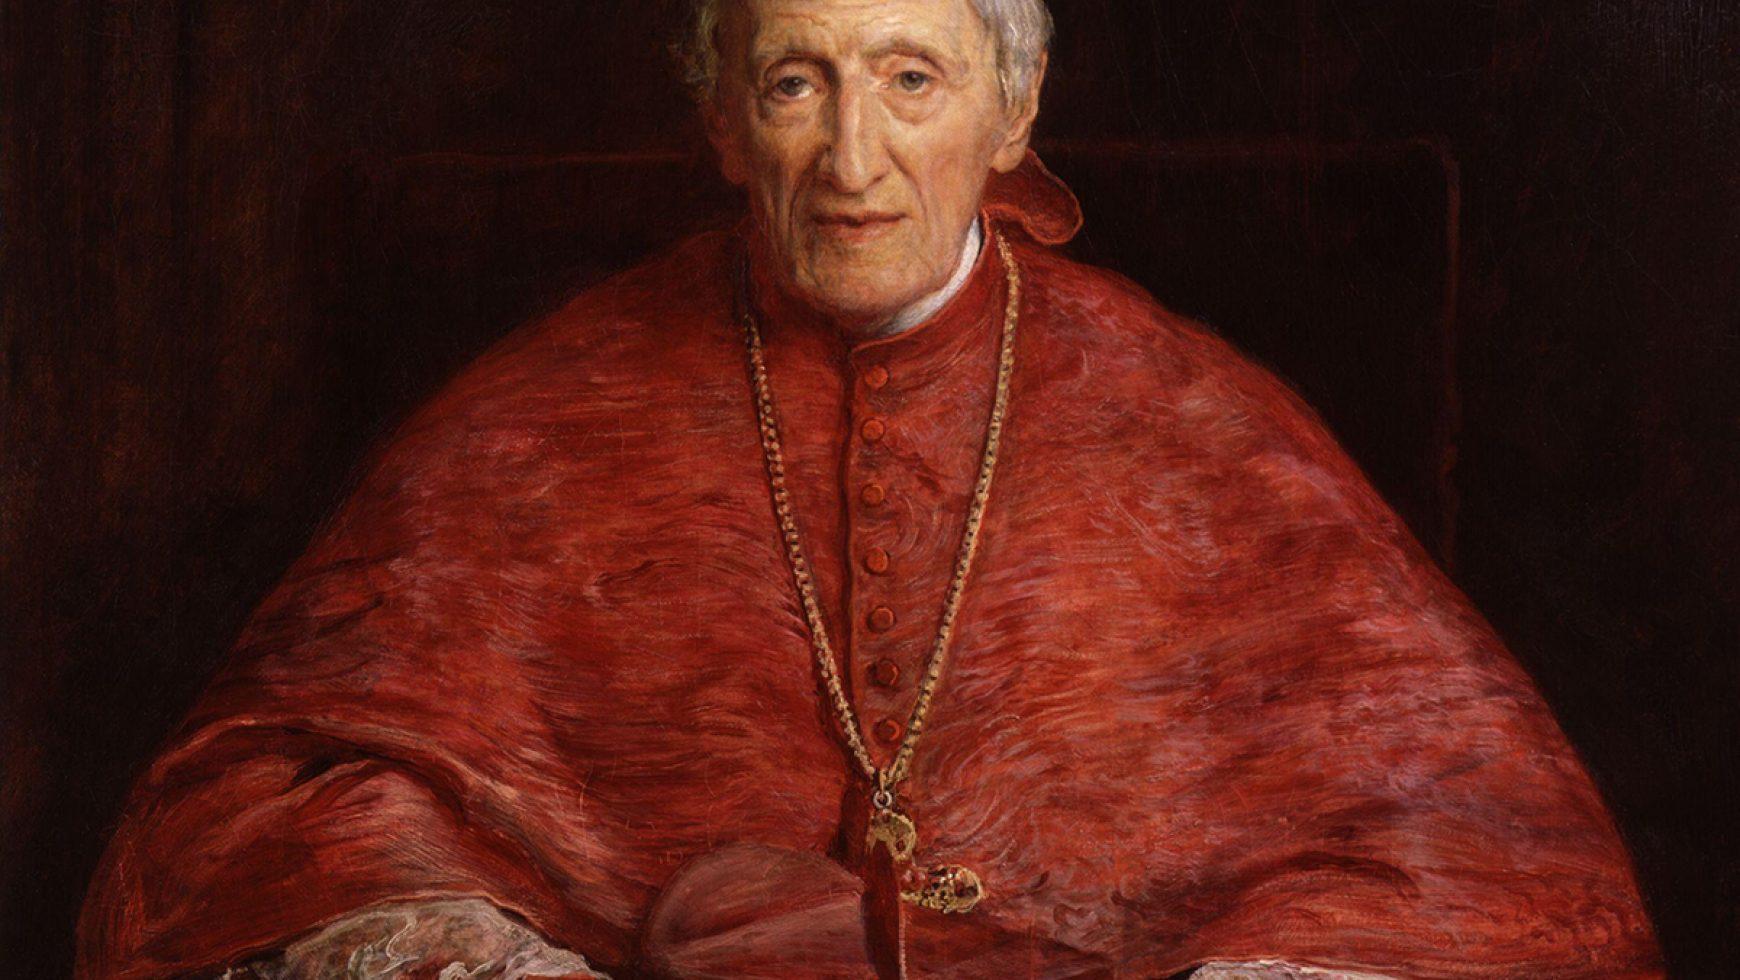 Christian Unity and Cardinal Newman